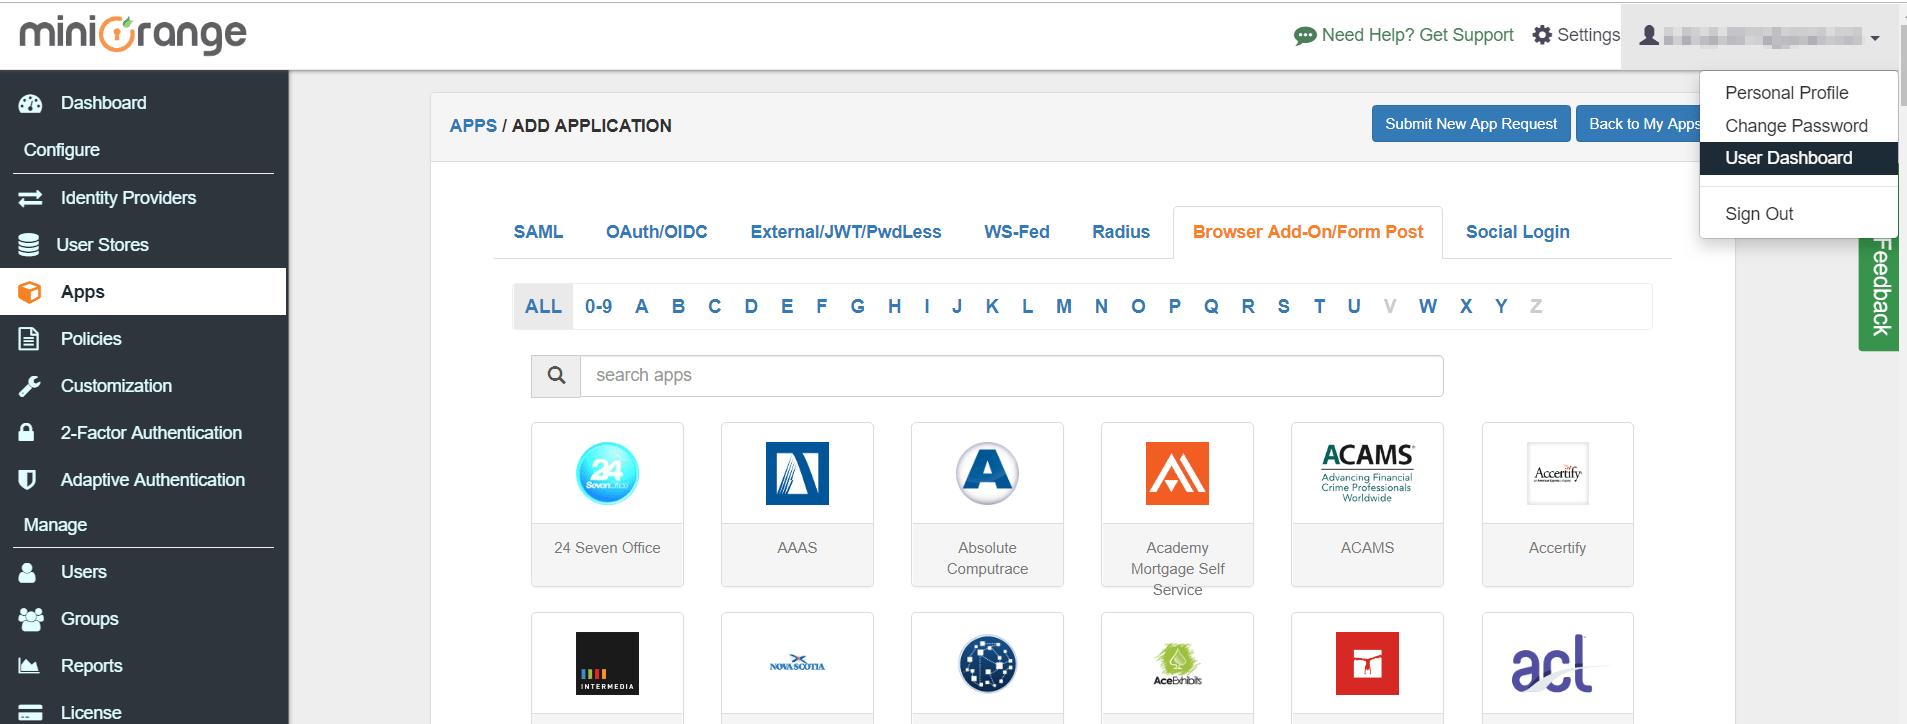 User Dashboard Browser SSO Apps